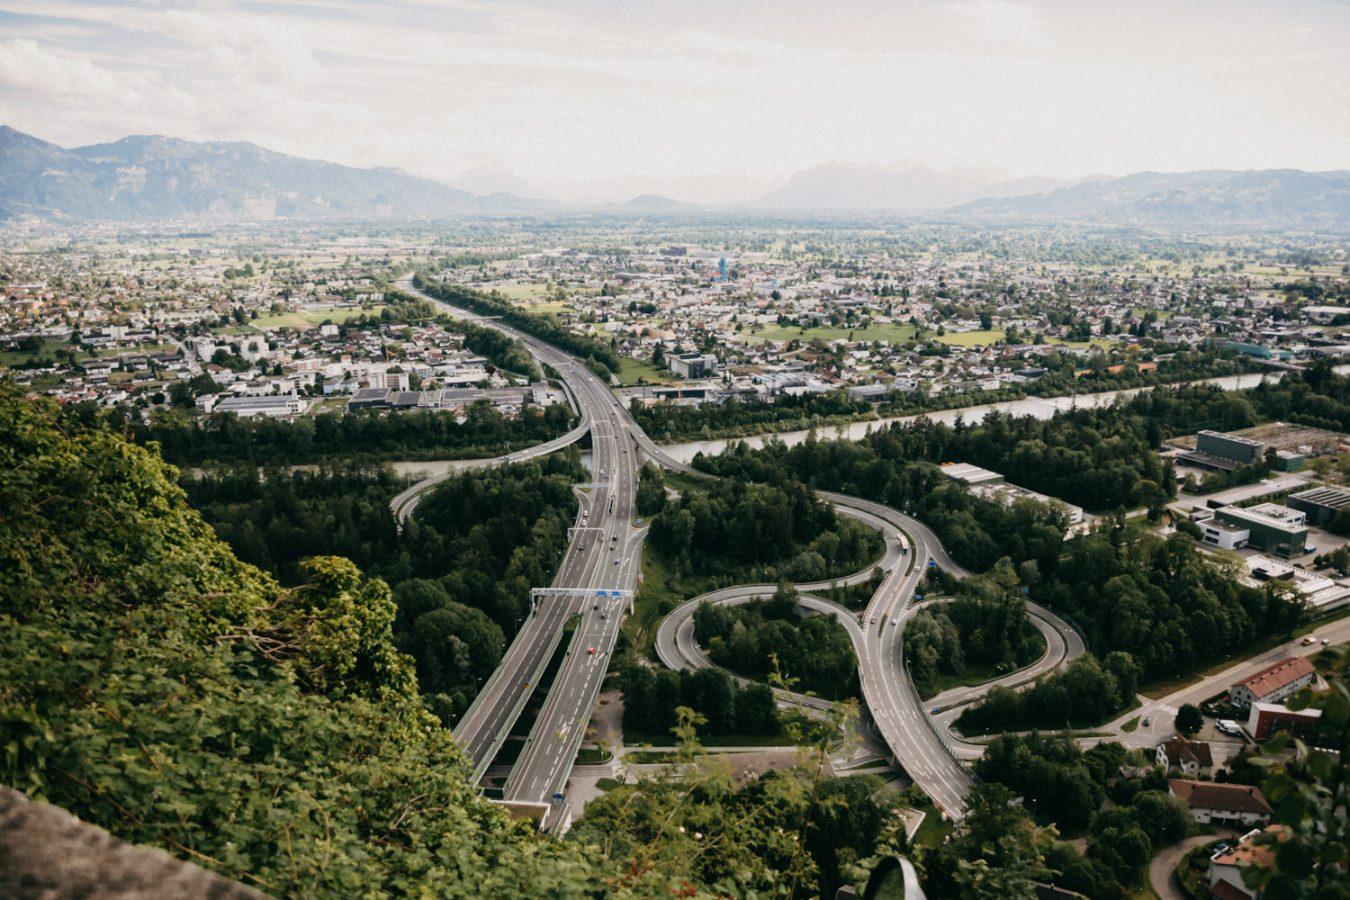 St. Gebhardsberg Panorama